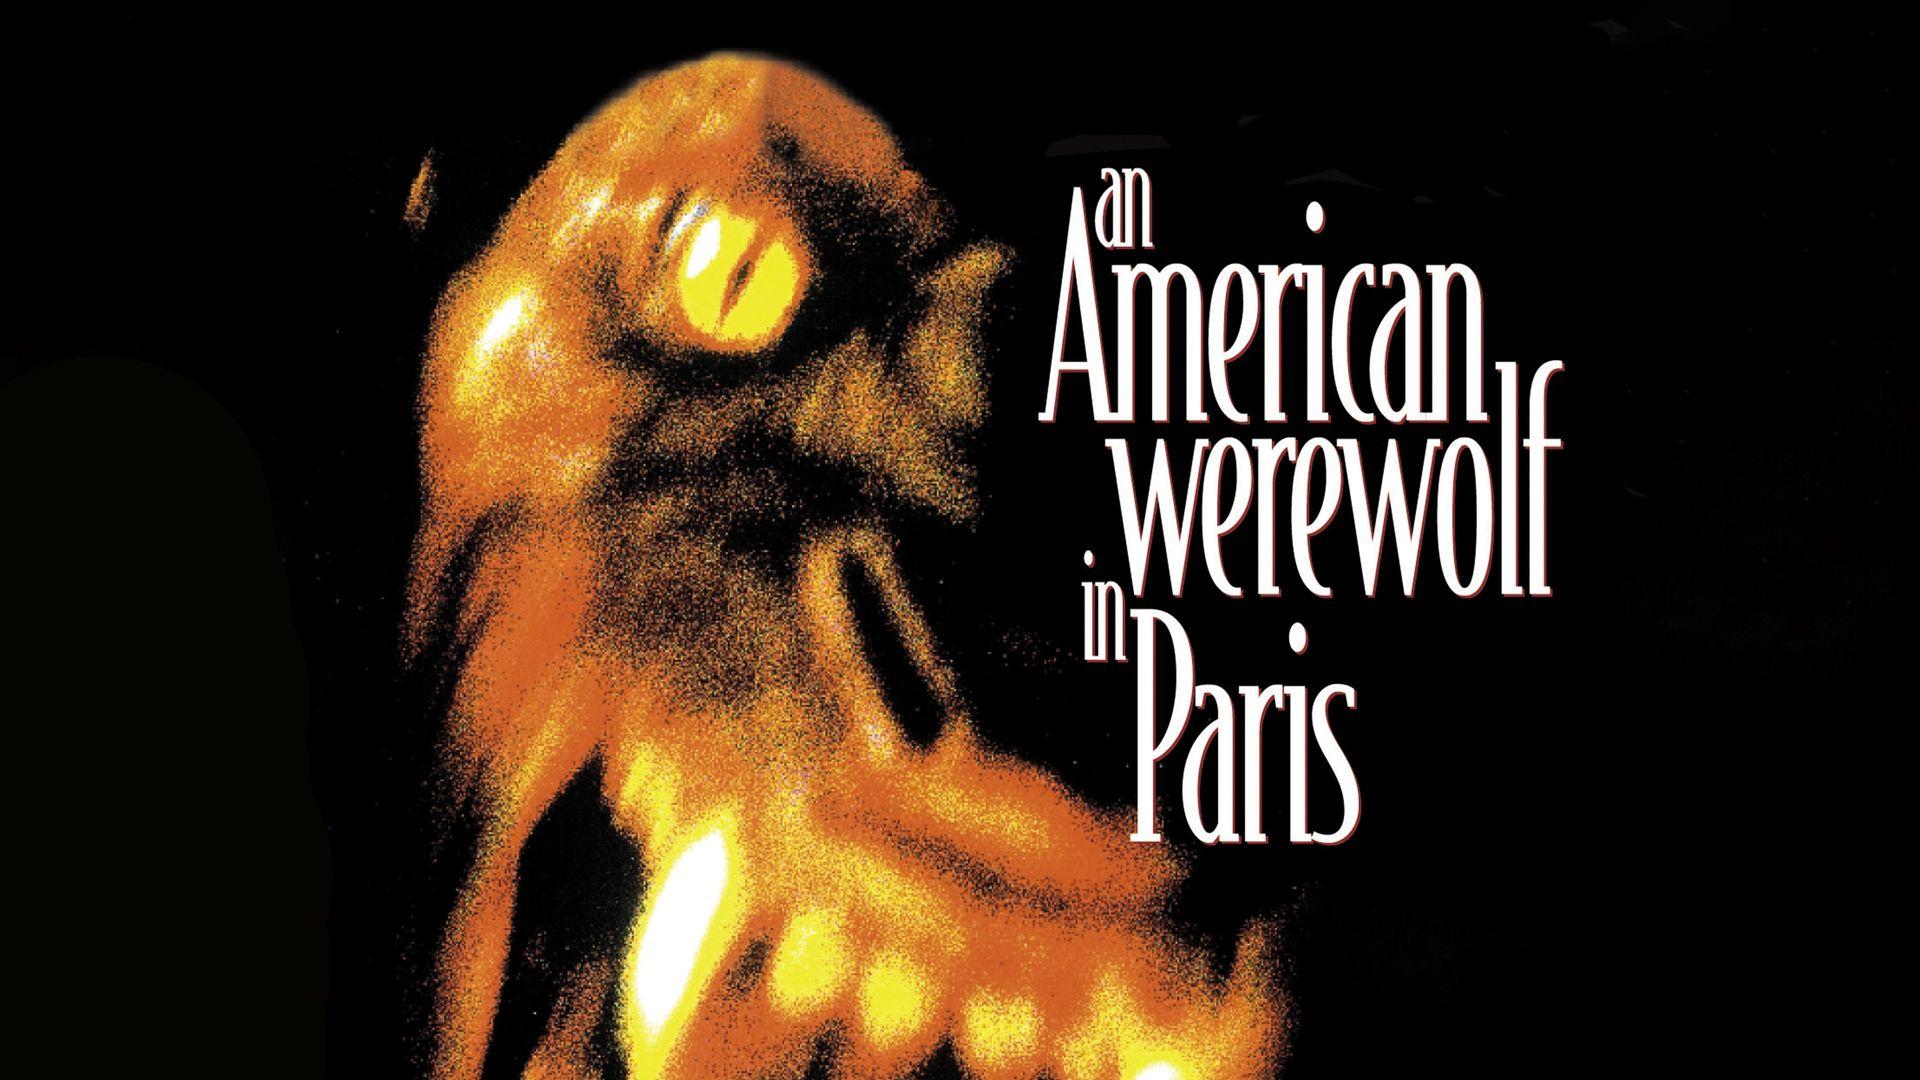 An American Werewolf In Paris 1997 Watch On Tubi Vudu Imdb